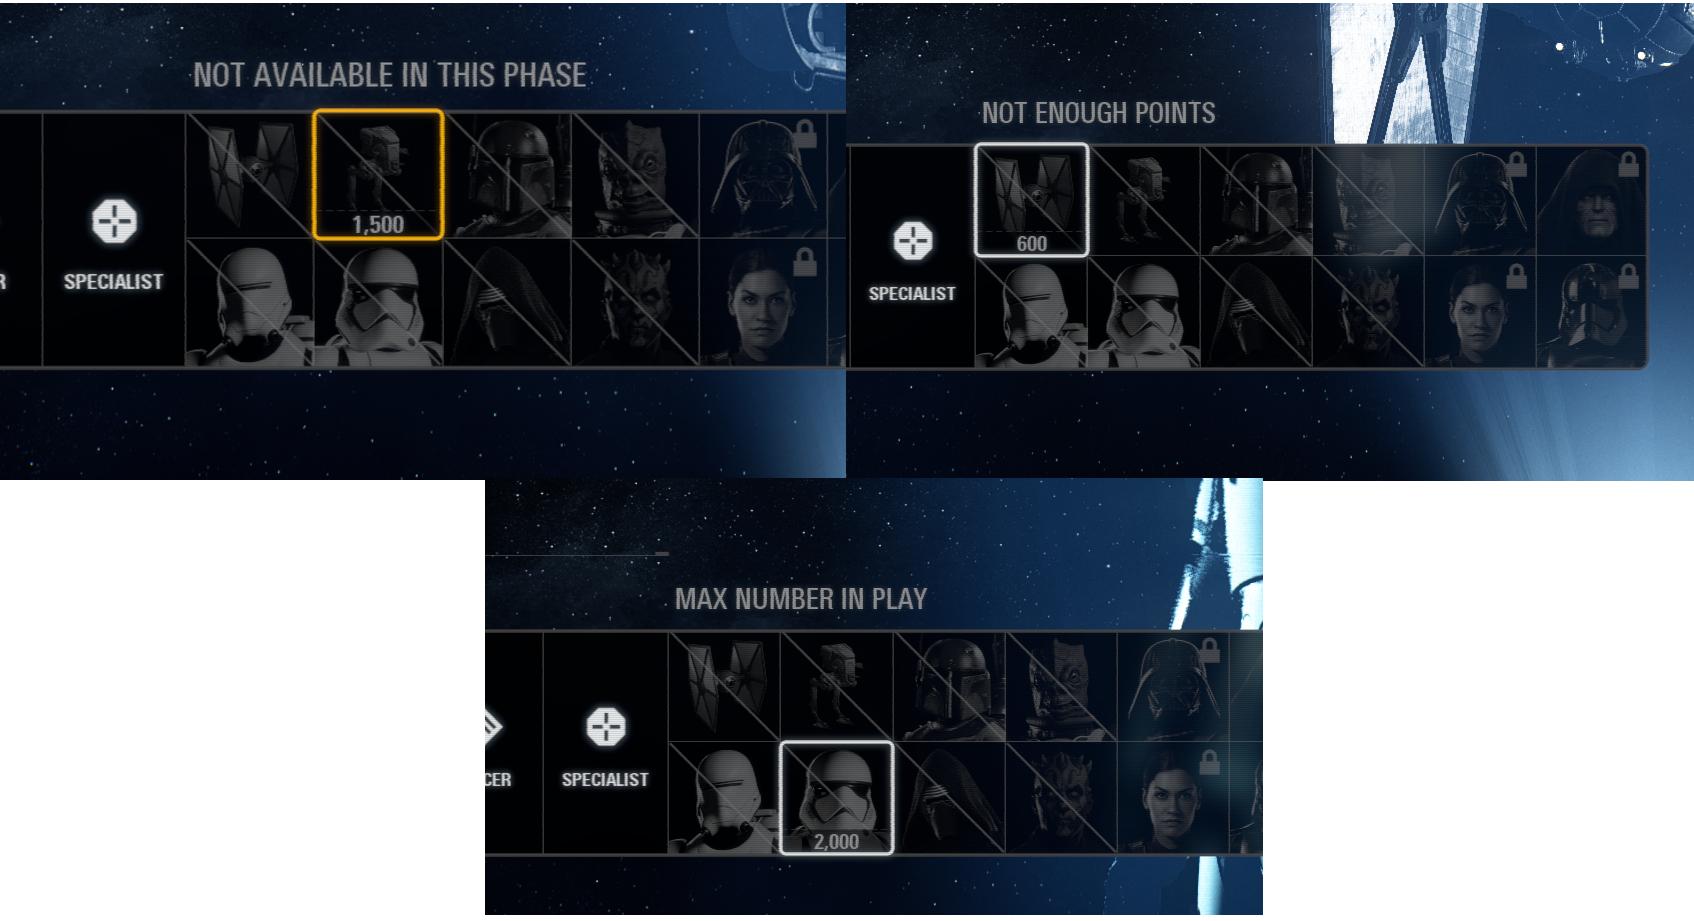 Star Wars Battlefront II, EA DICE, EA, 2017